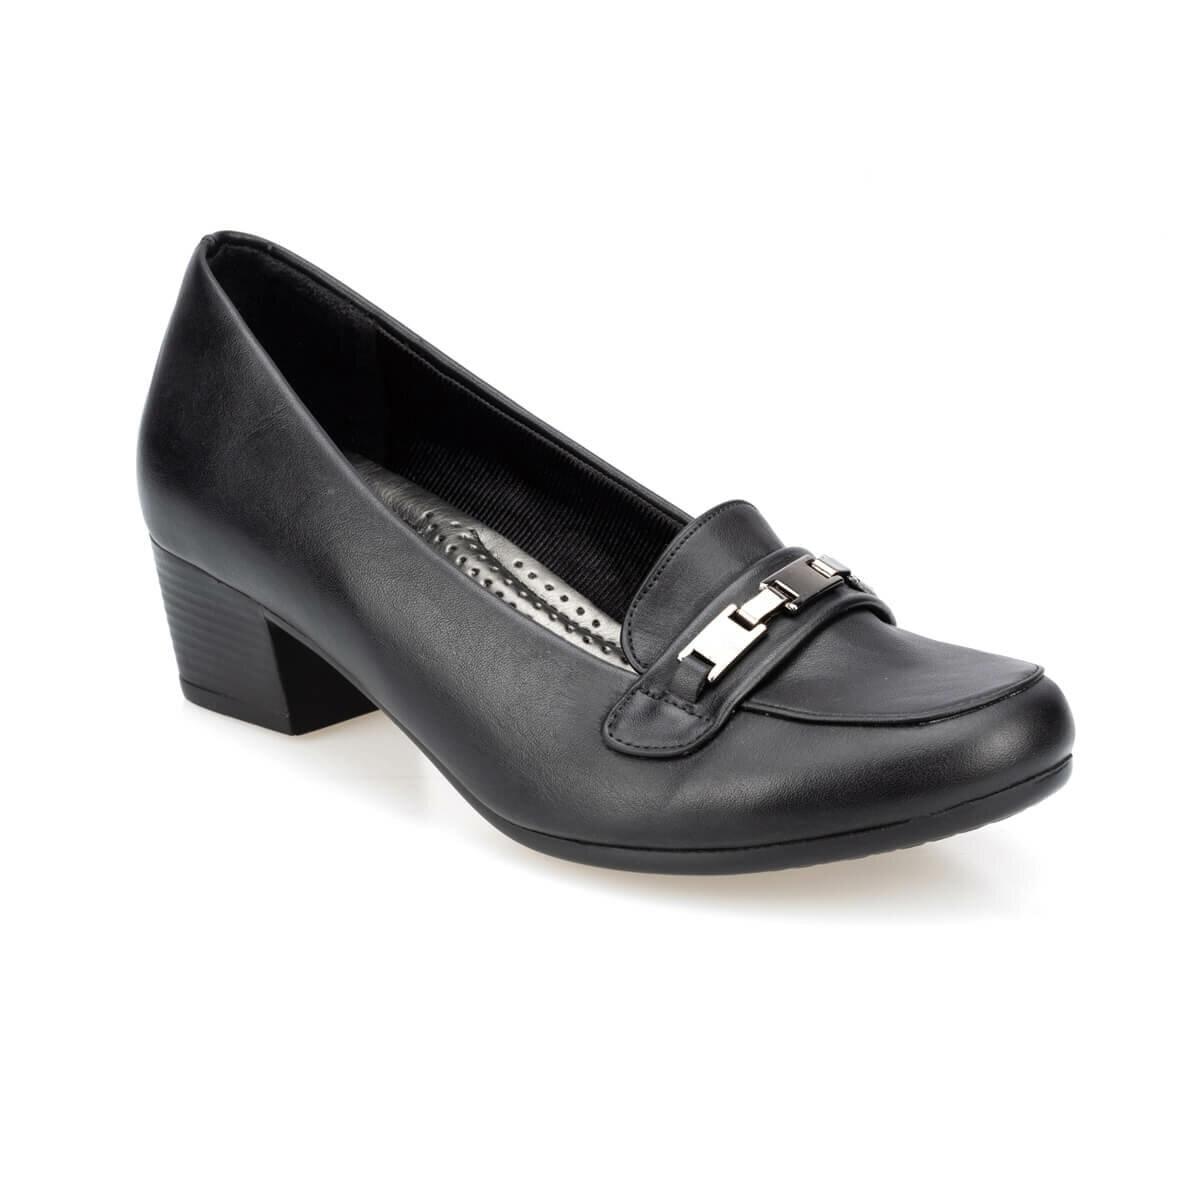 FLO 91.156599.Z Black Women Shoes Polaris